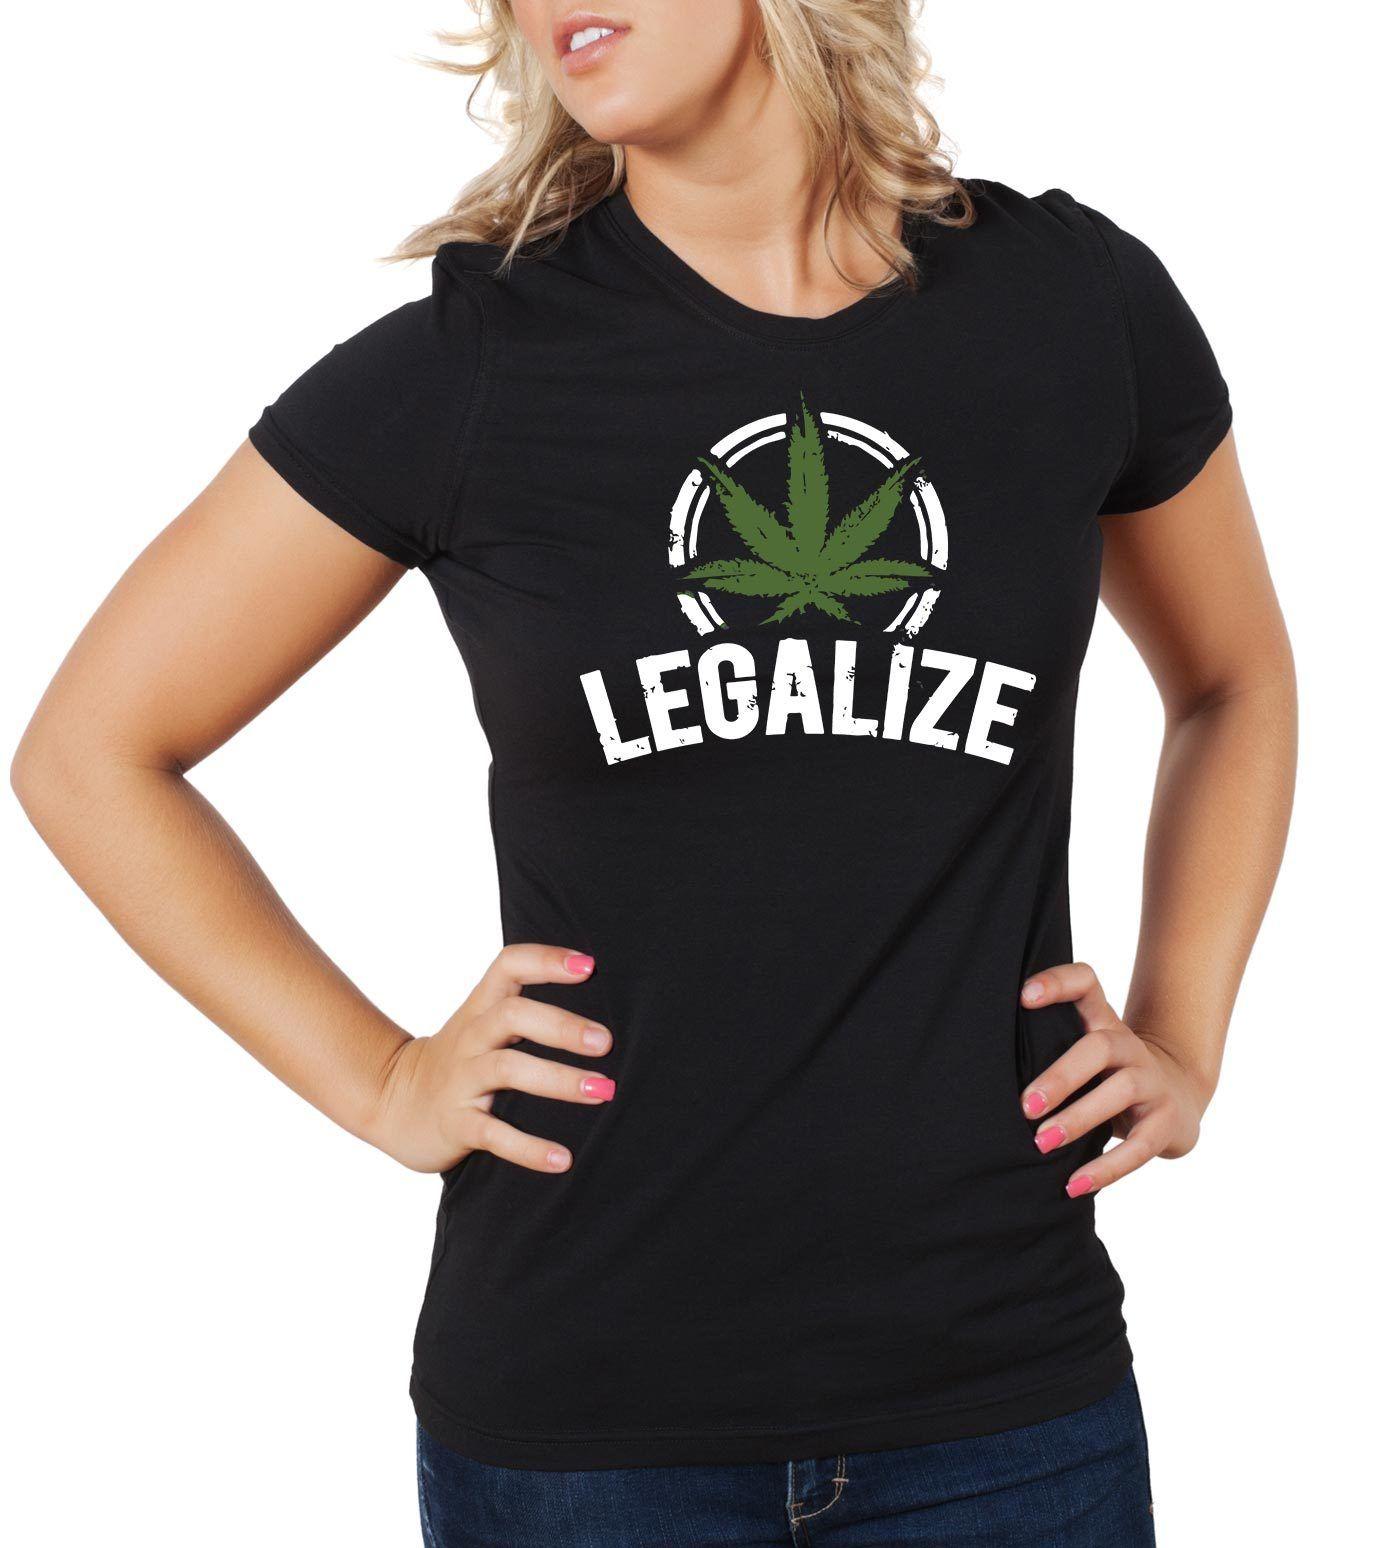 Legalize Weed Trend T-shirt Hashish Shirts Cannabis 1